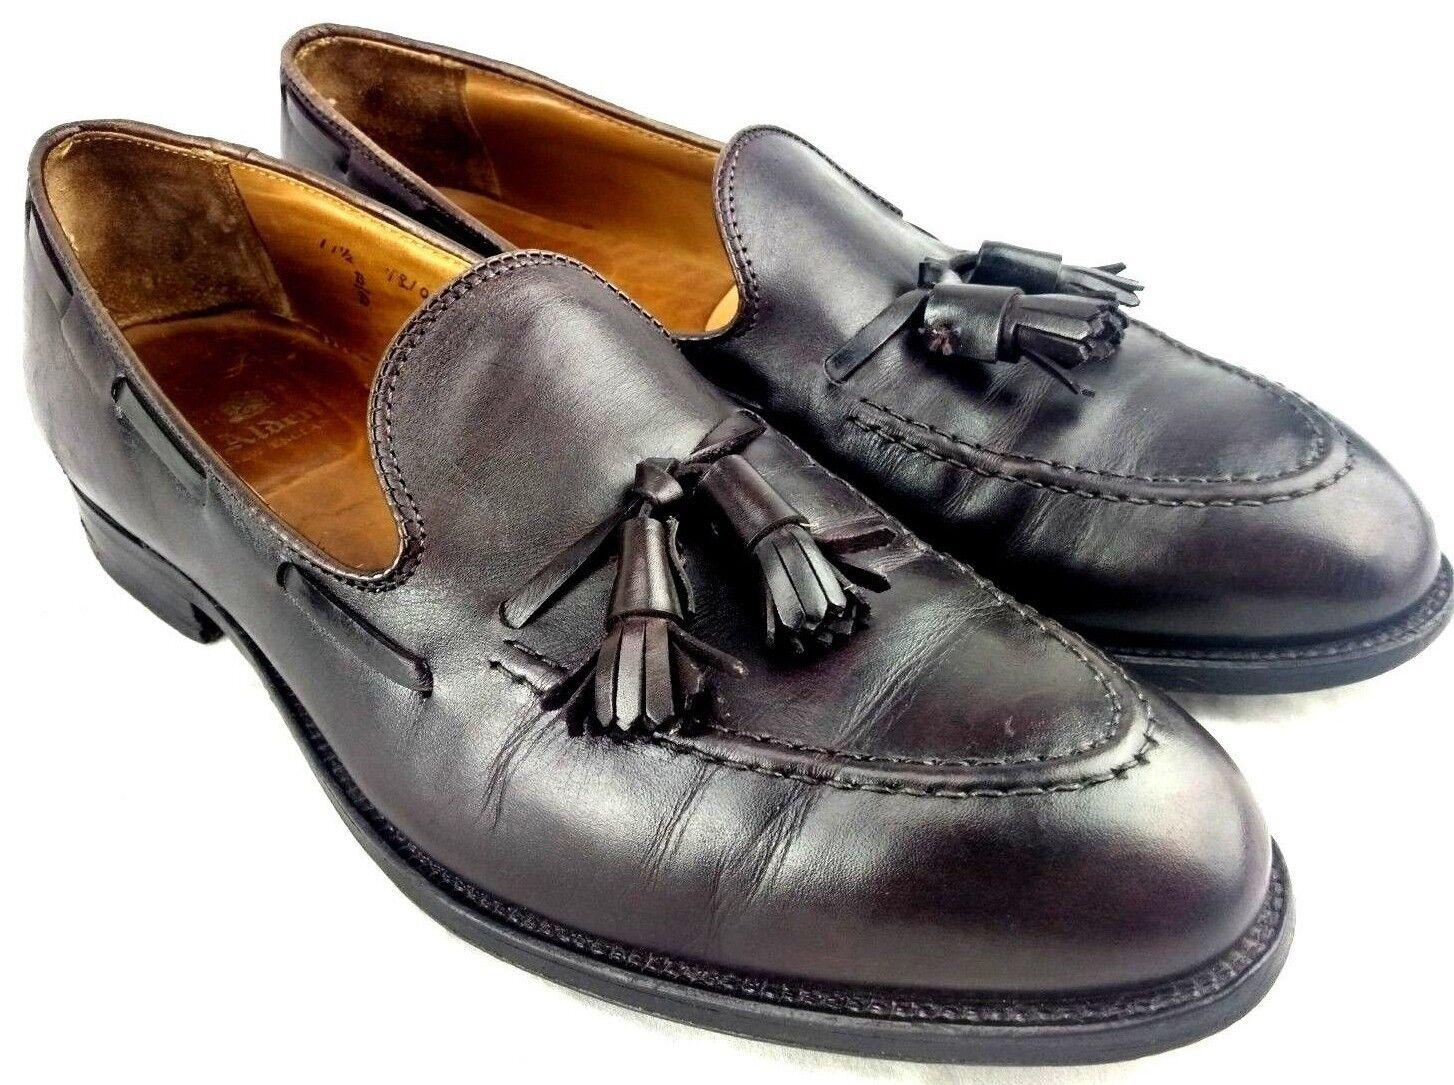 ALDEN 663 Mens Sz 11.5 B D Calfskin Dress Loafers Tassel Moc Toe Burgundy 40-10